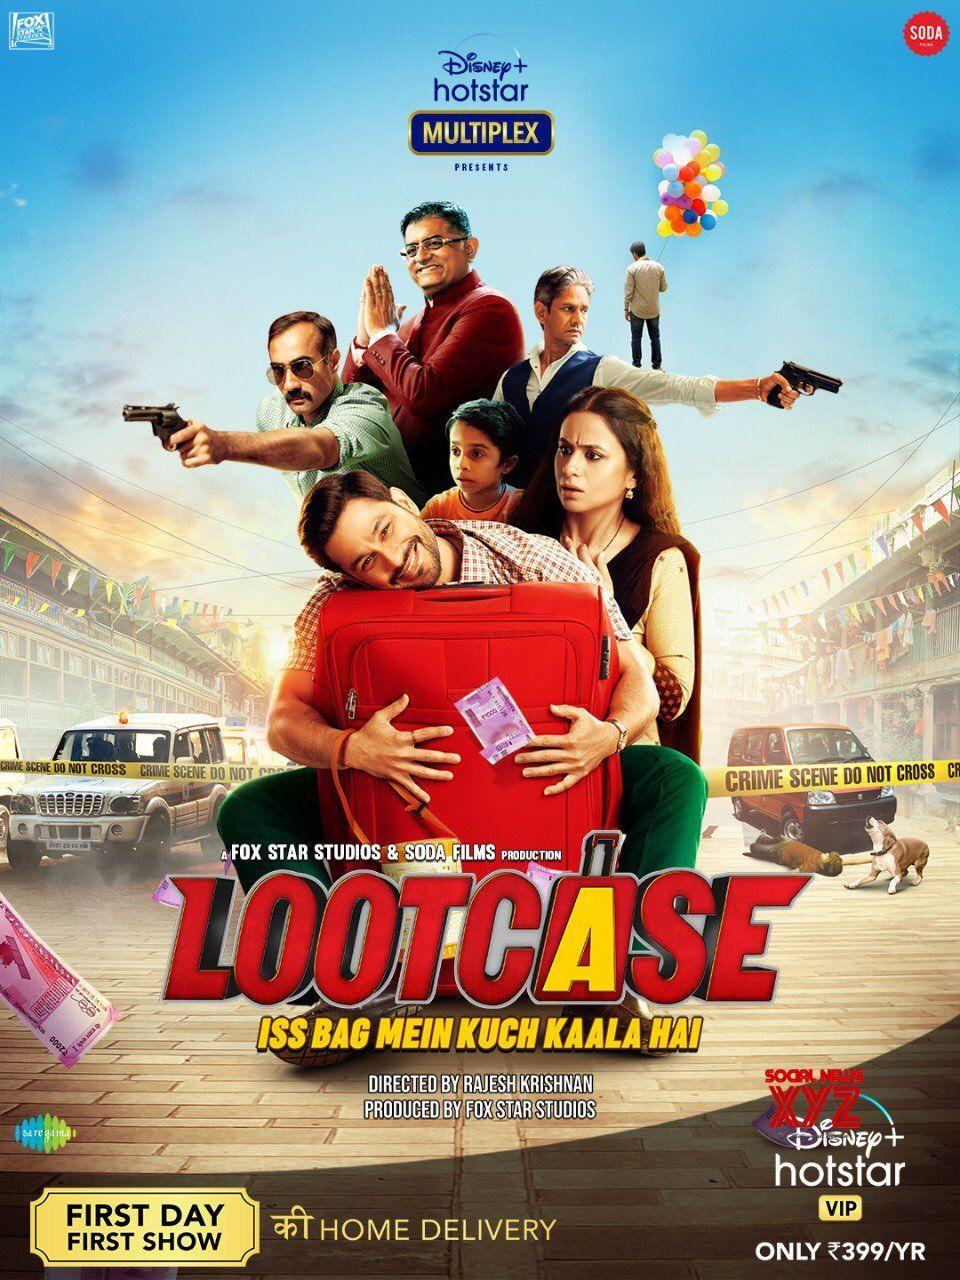 Kunal Kemmu S Lootcase Only On Disney Plus Hotstar Vip With Disney Plus Hotstar Multiplex Social News Xyz In 2020 Disney Plus Bollywood Movies Hindi Movies